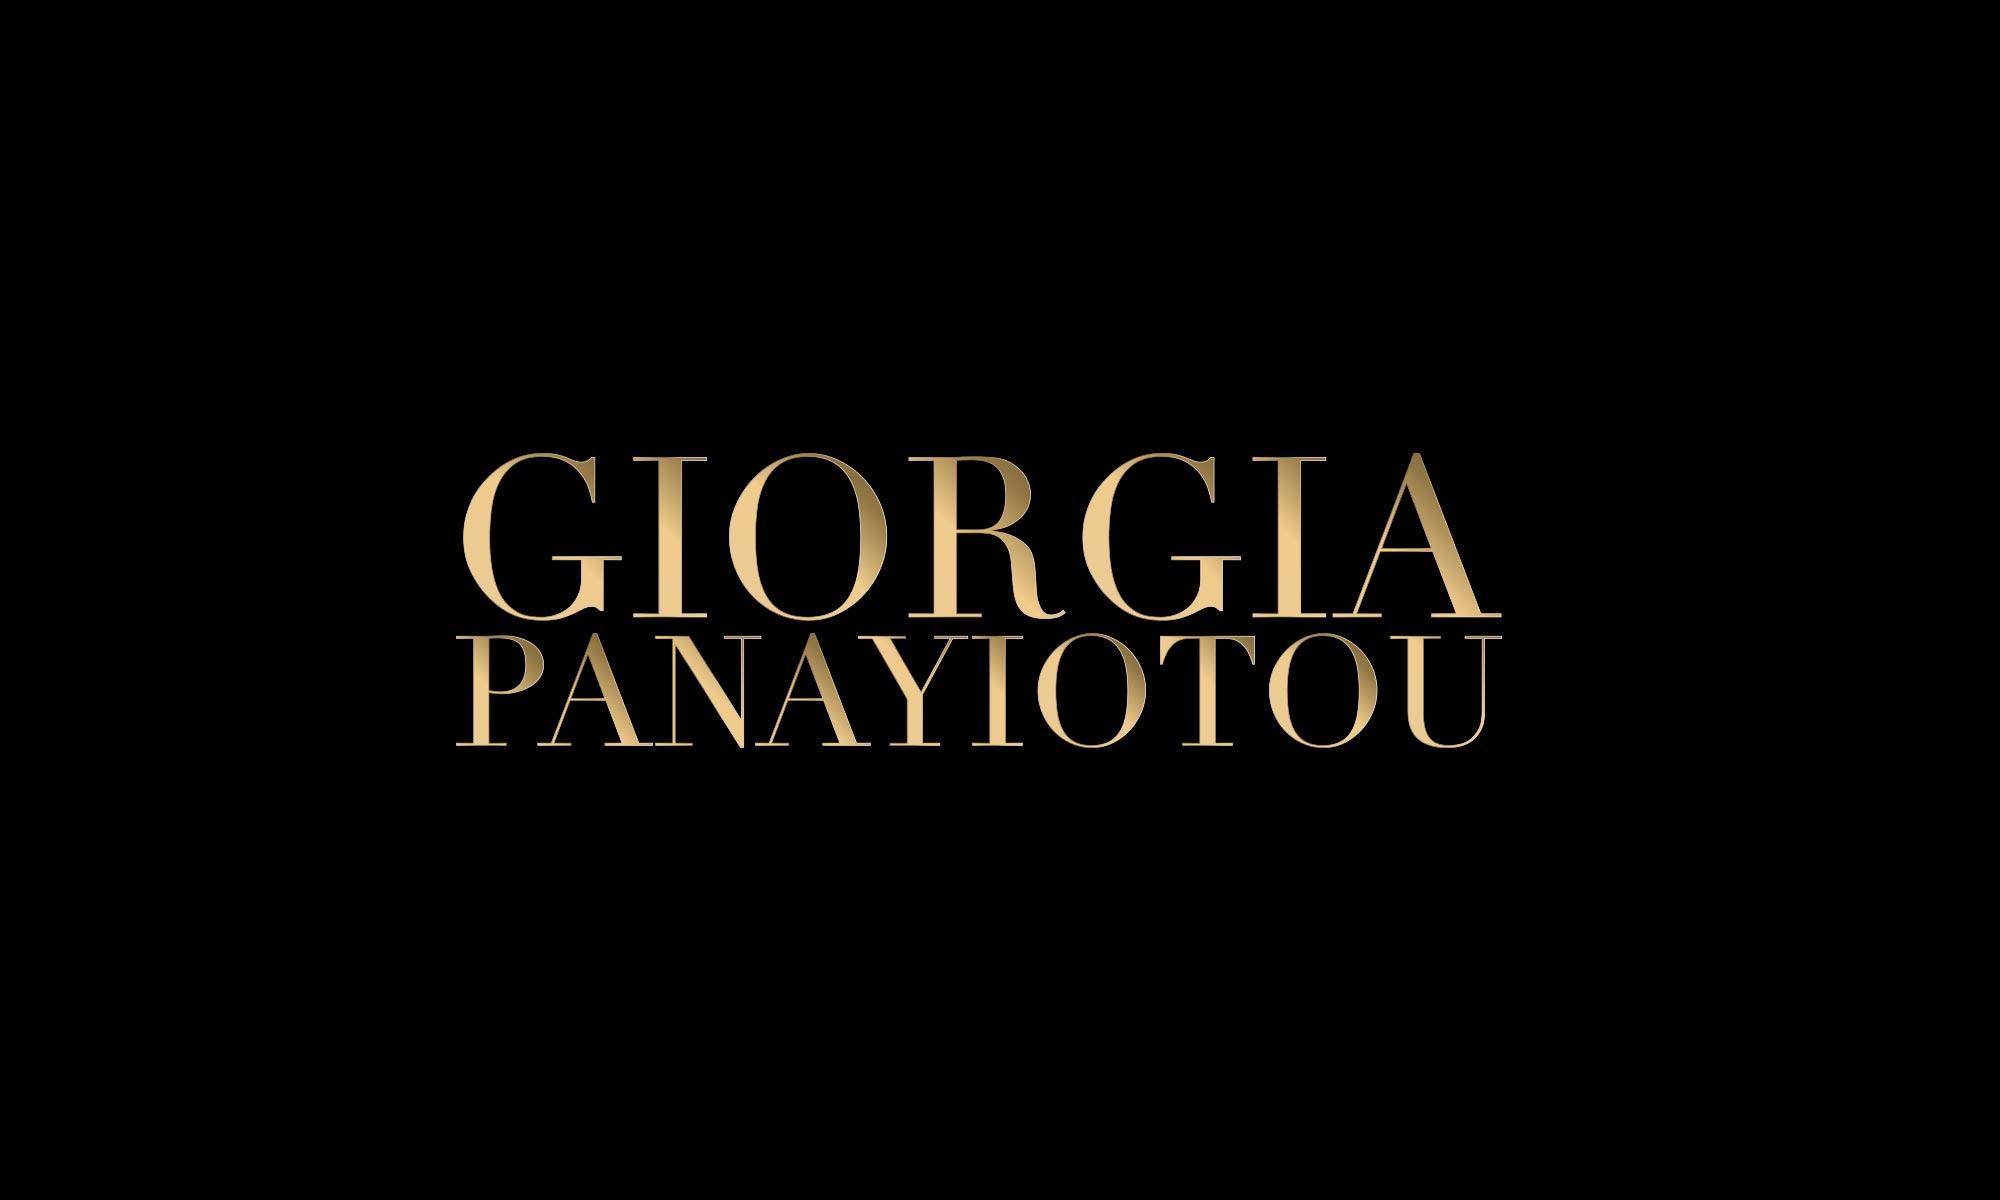 https://www.atelierzoz.com/wp-content/uploads/2020/03/works_giorgia-panayiotou-1.jpg